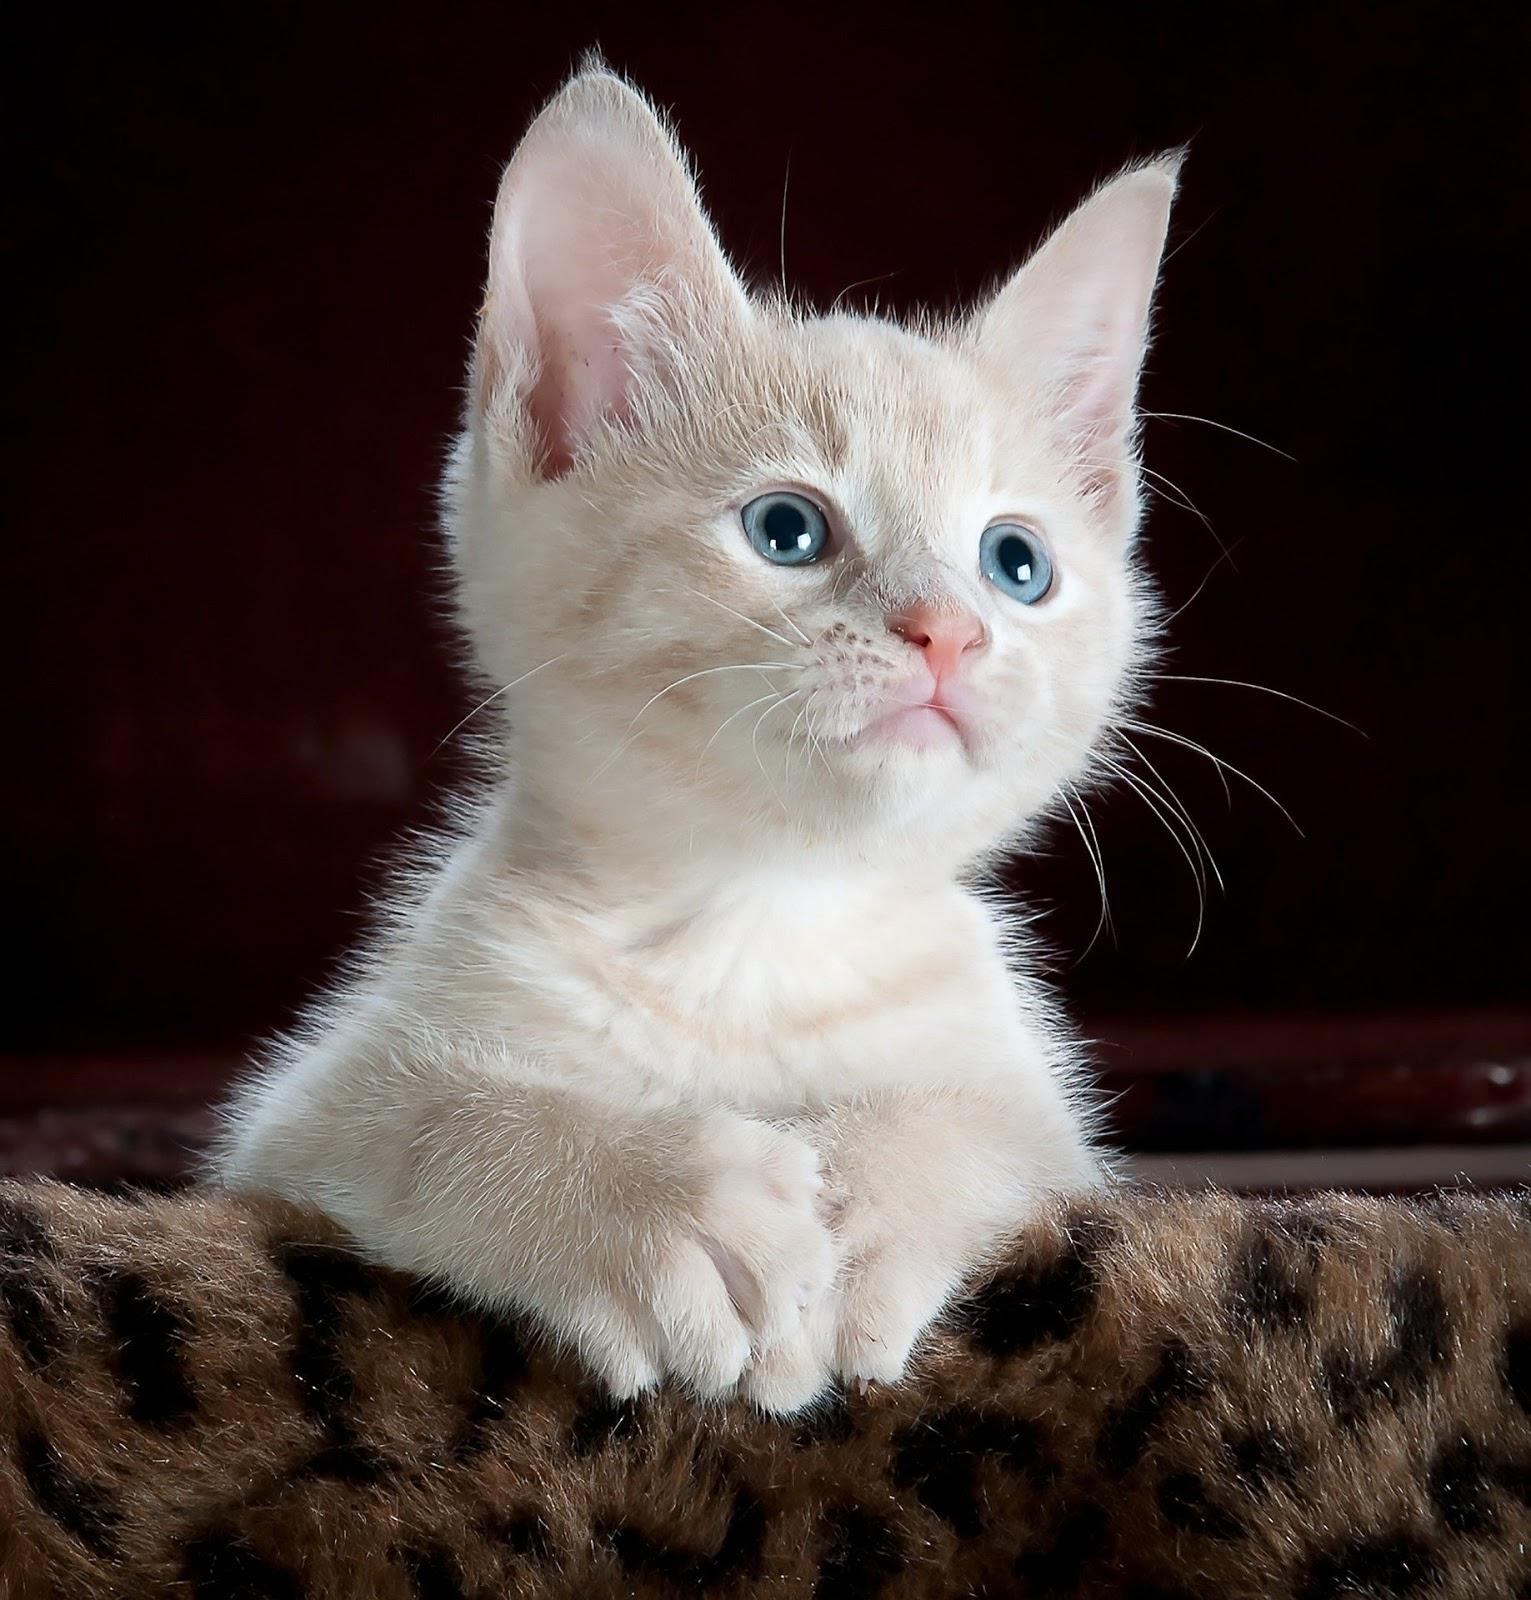 Kitty Cat Kitten Pet Animal Cute Feline Domestic,cat images